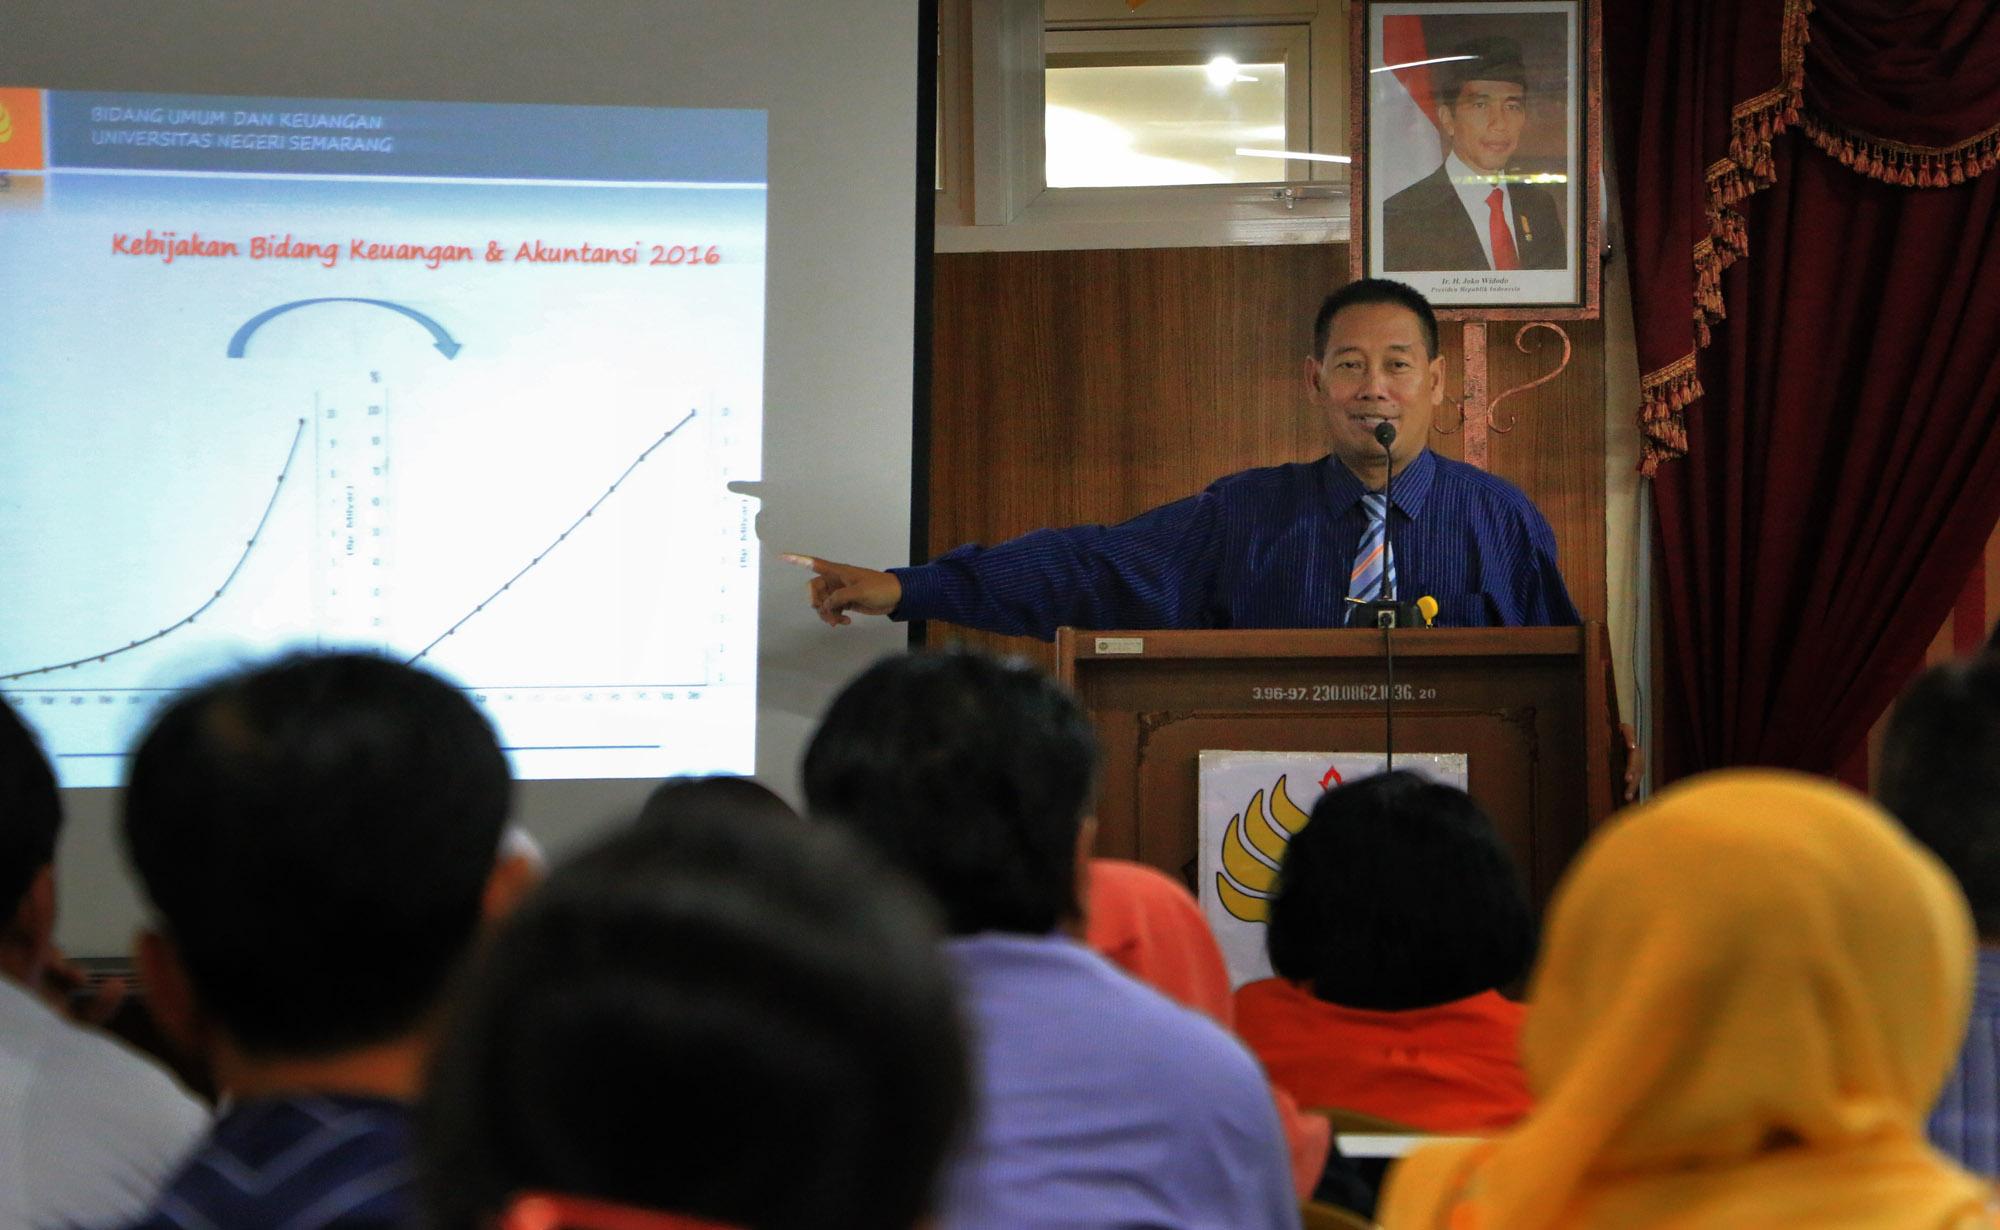 BPK Unnes Gelar Bimbingan Teknis Perencanaan Keuangan